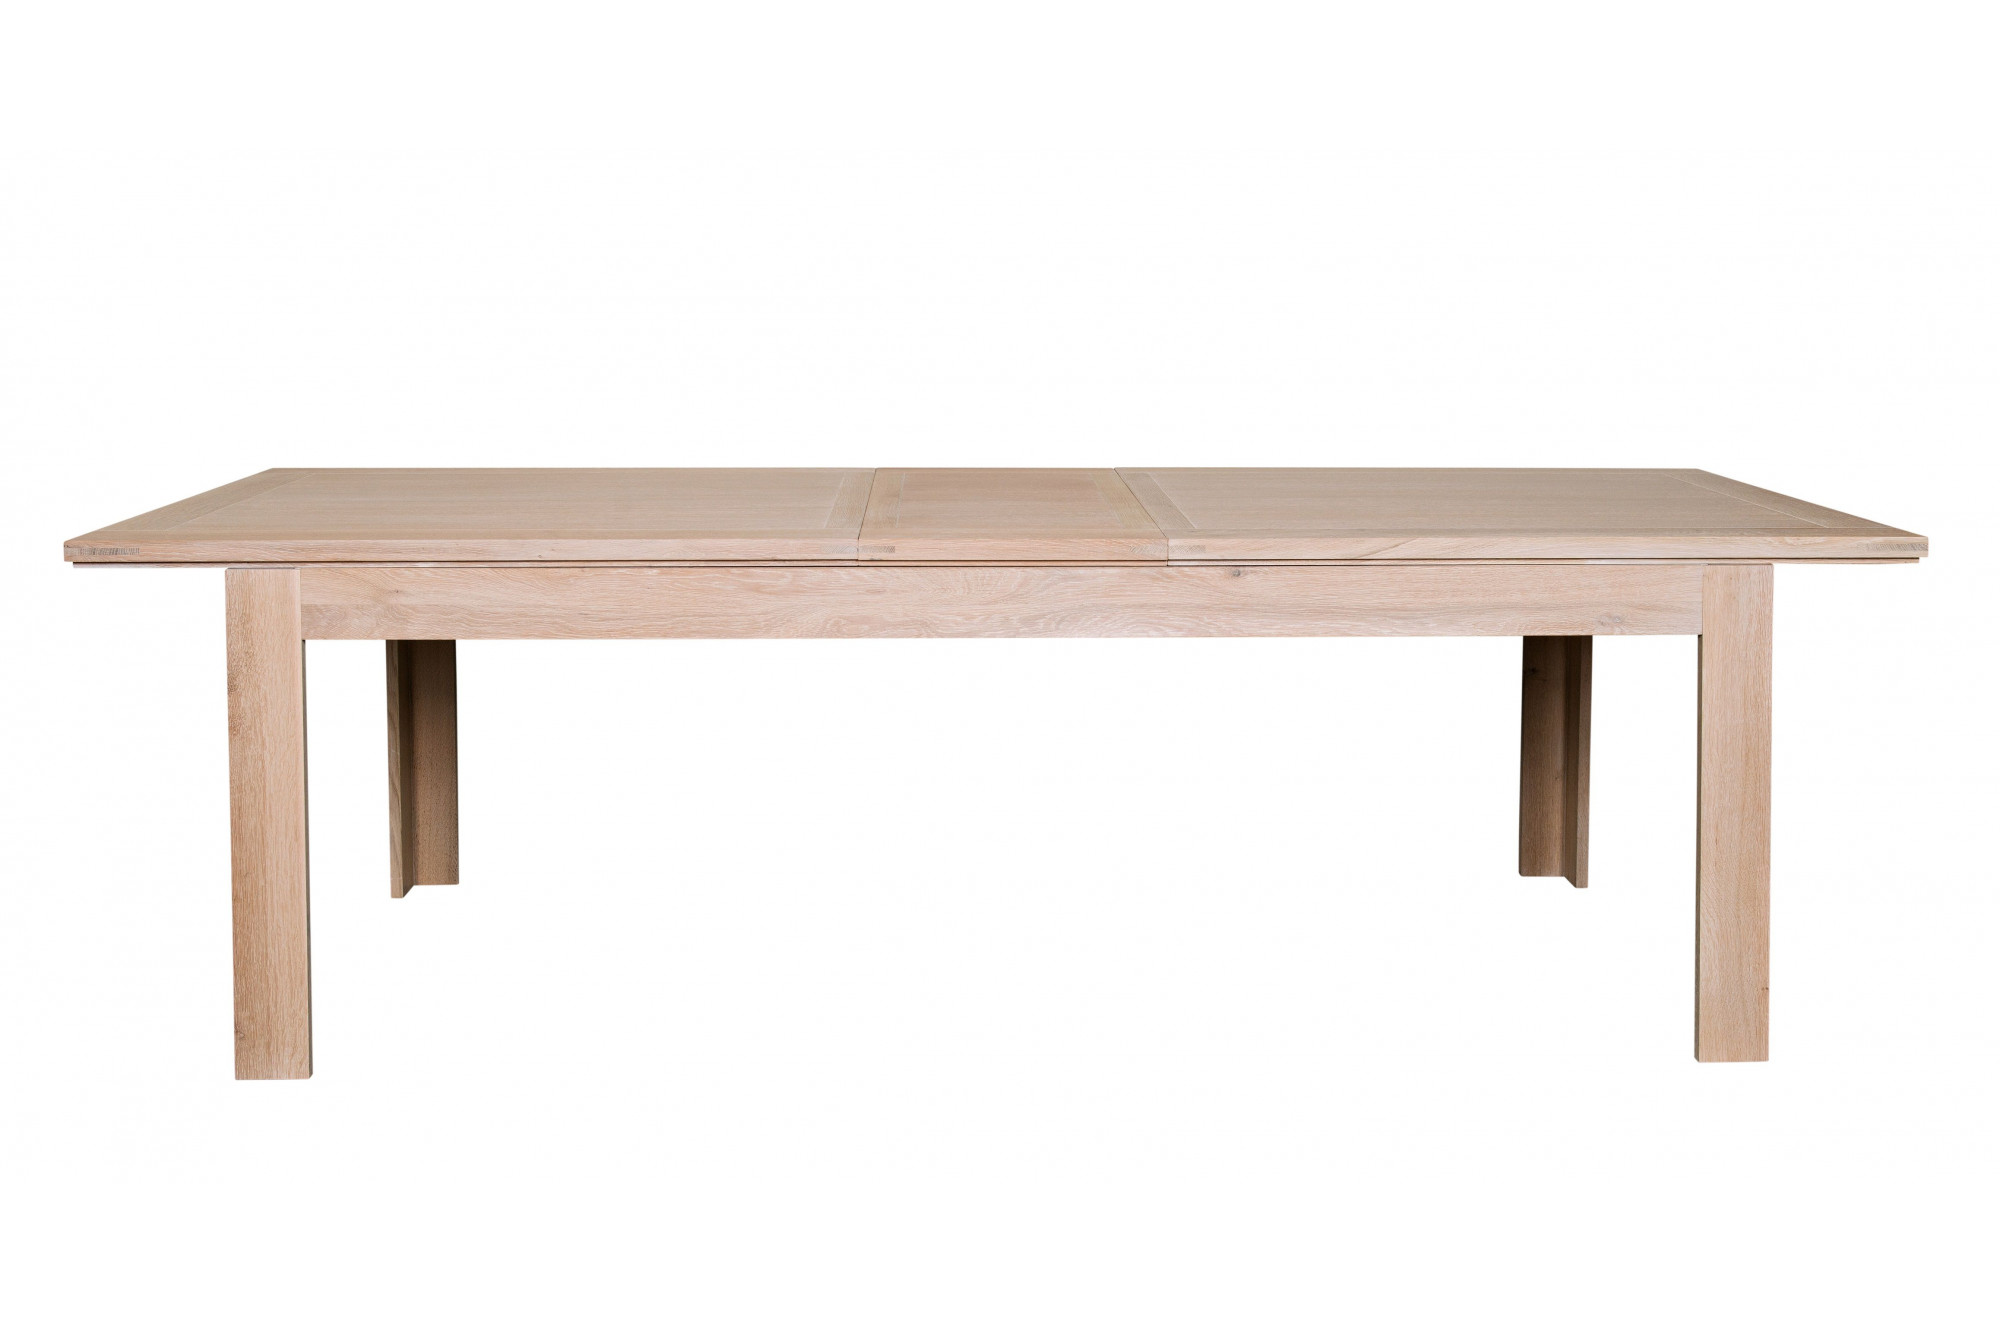 table moderne avec allonges centrales en bois et ch ne boston hellin. Black Bedroom Furniture Sets. Home Design Ideas